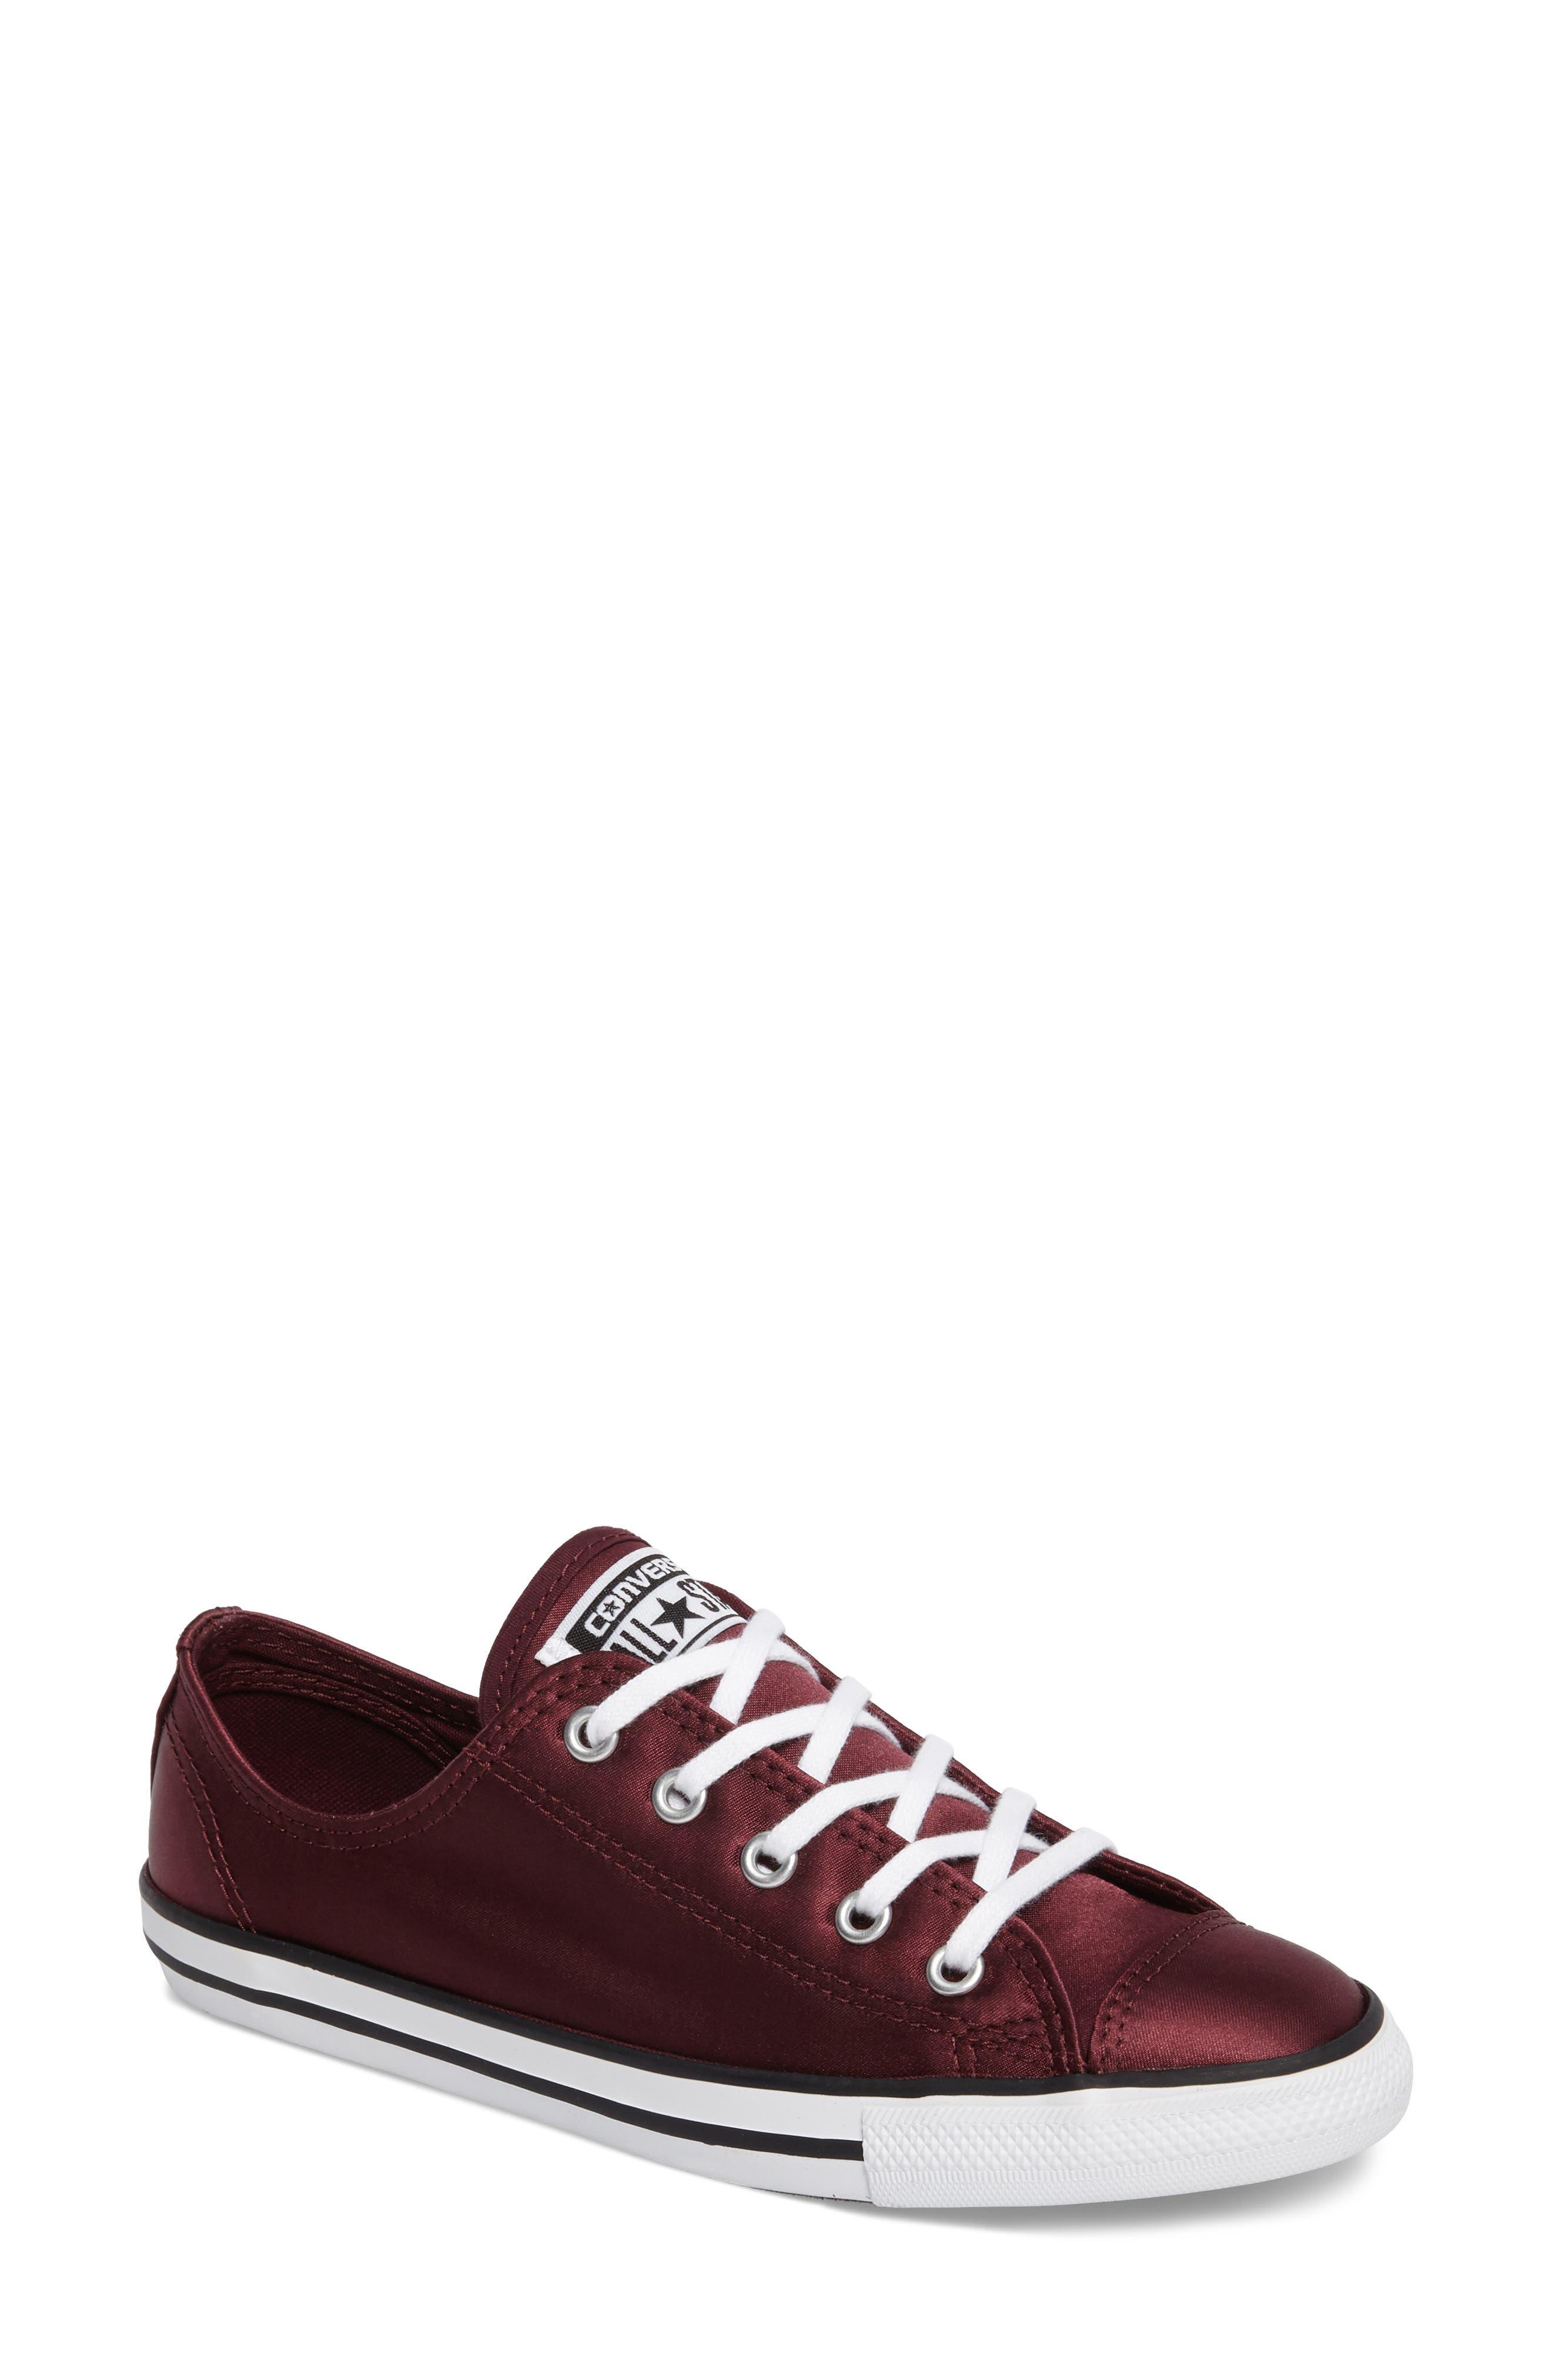 Converse Chuck Taylor® All Star® 'Dainty' Low Top Sneaker (Women)